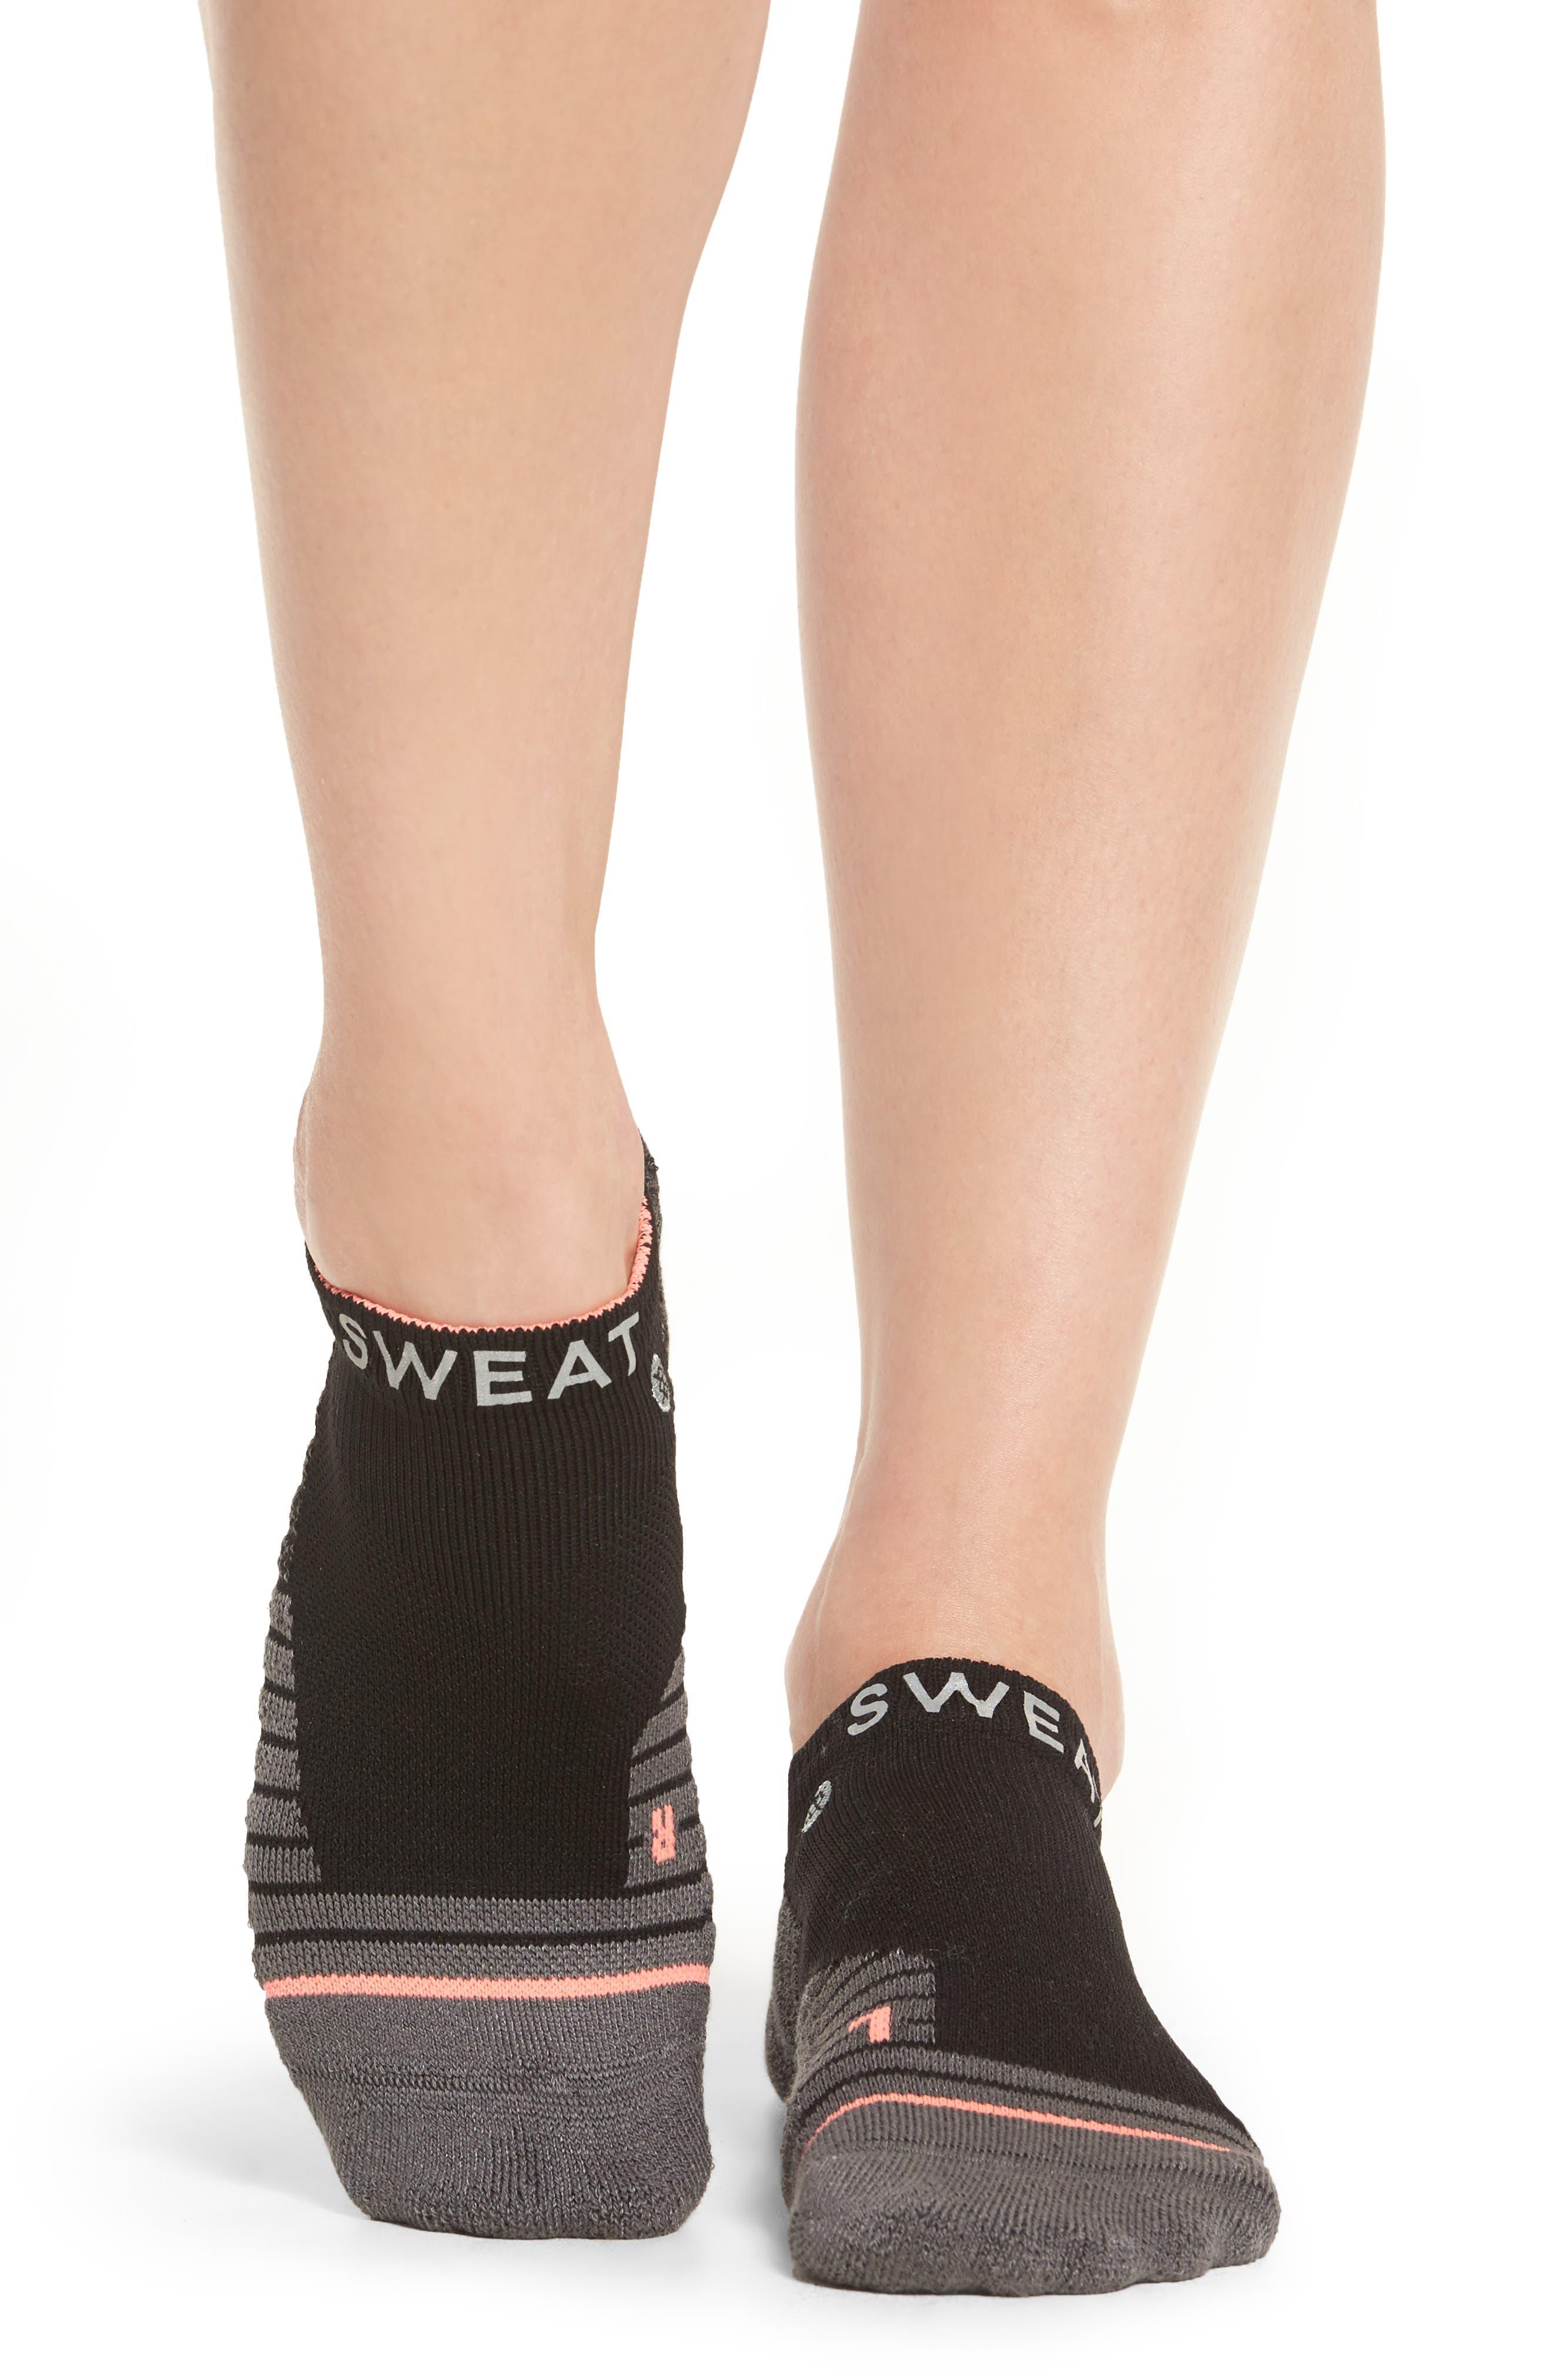 Reflective Sweat Socks,                             Alternate thumbnail 2, color,                             001